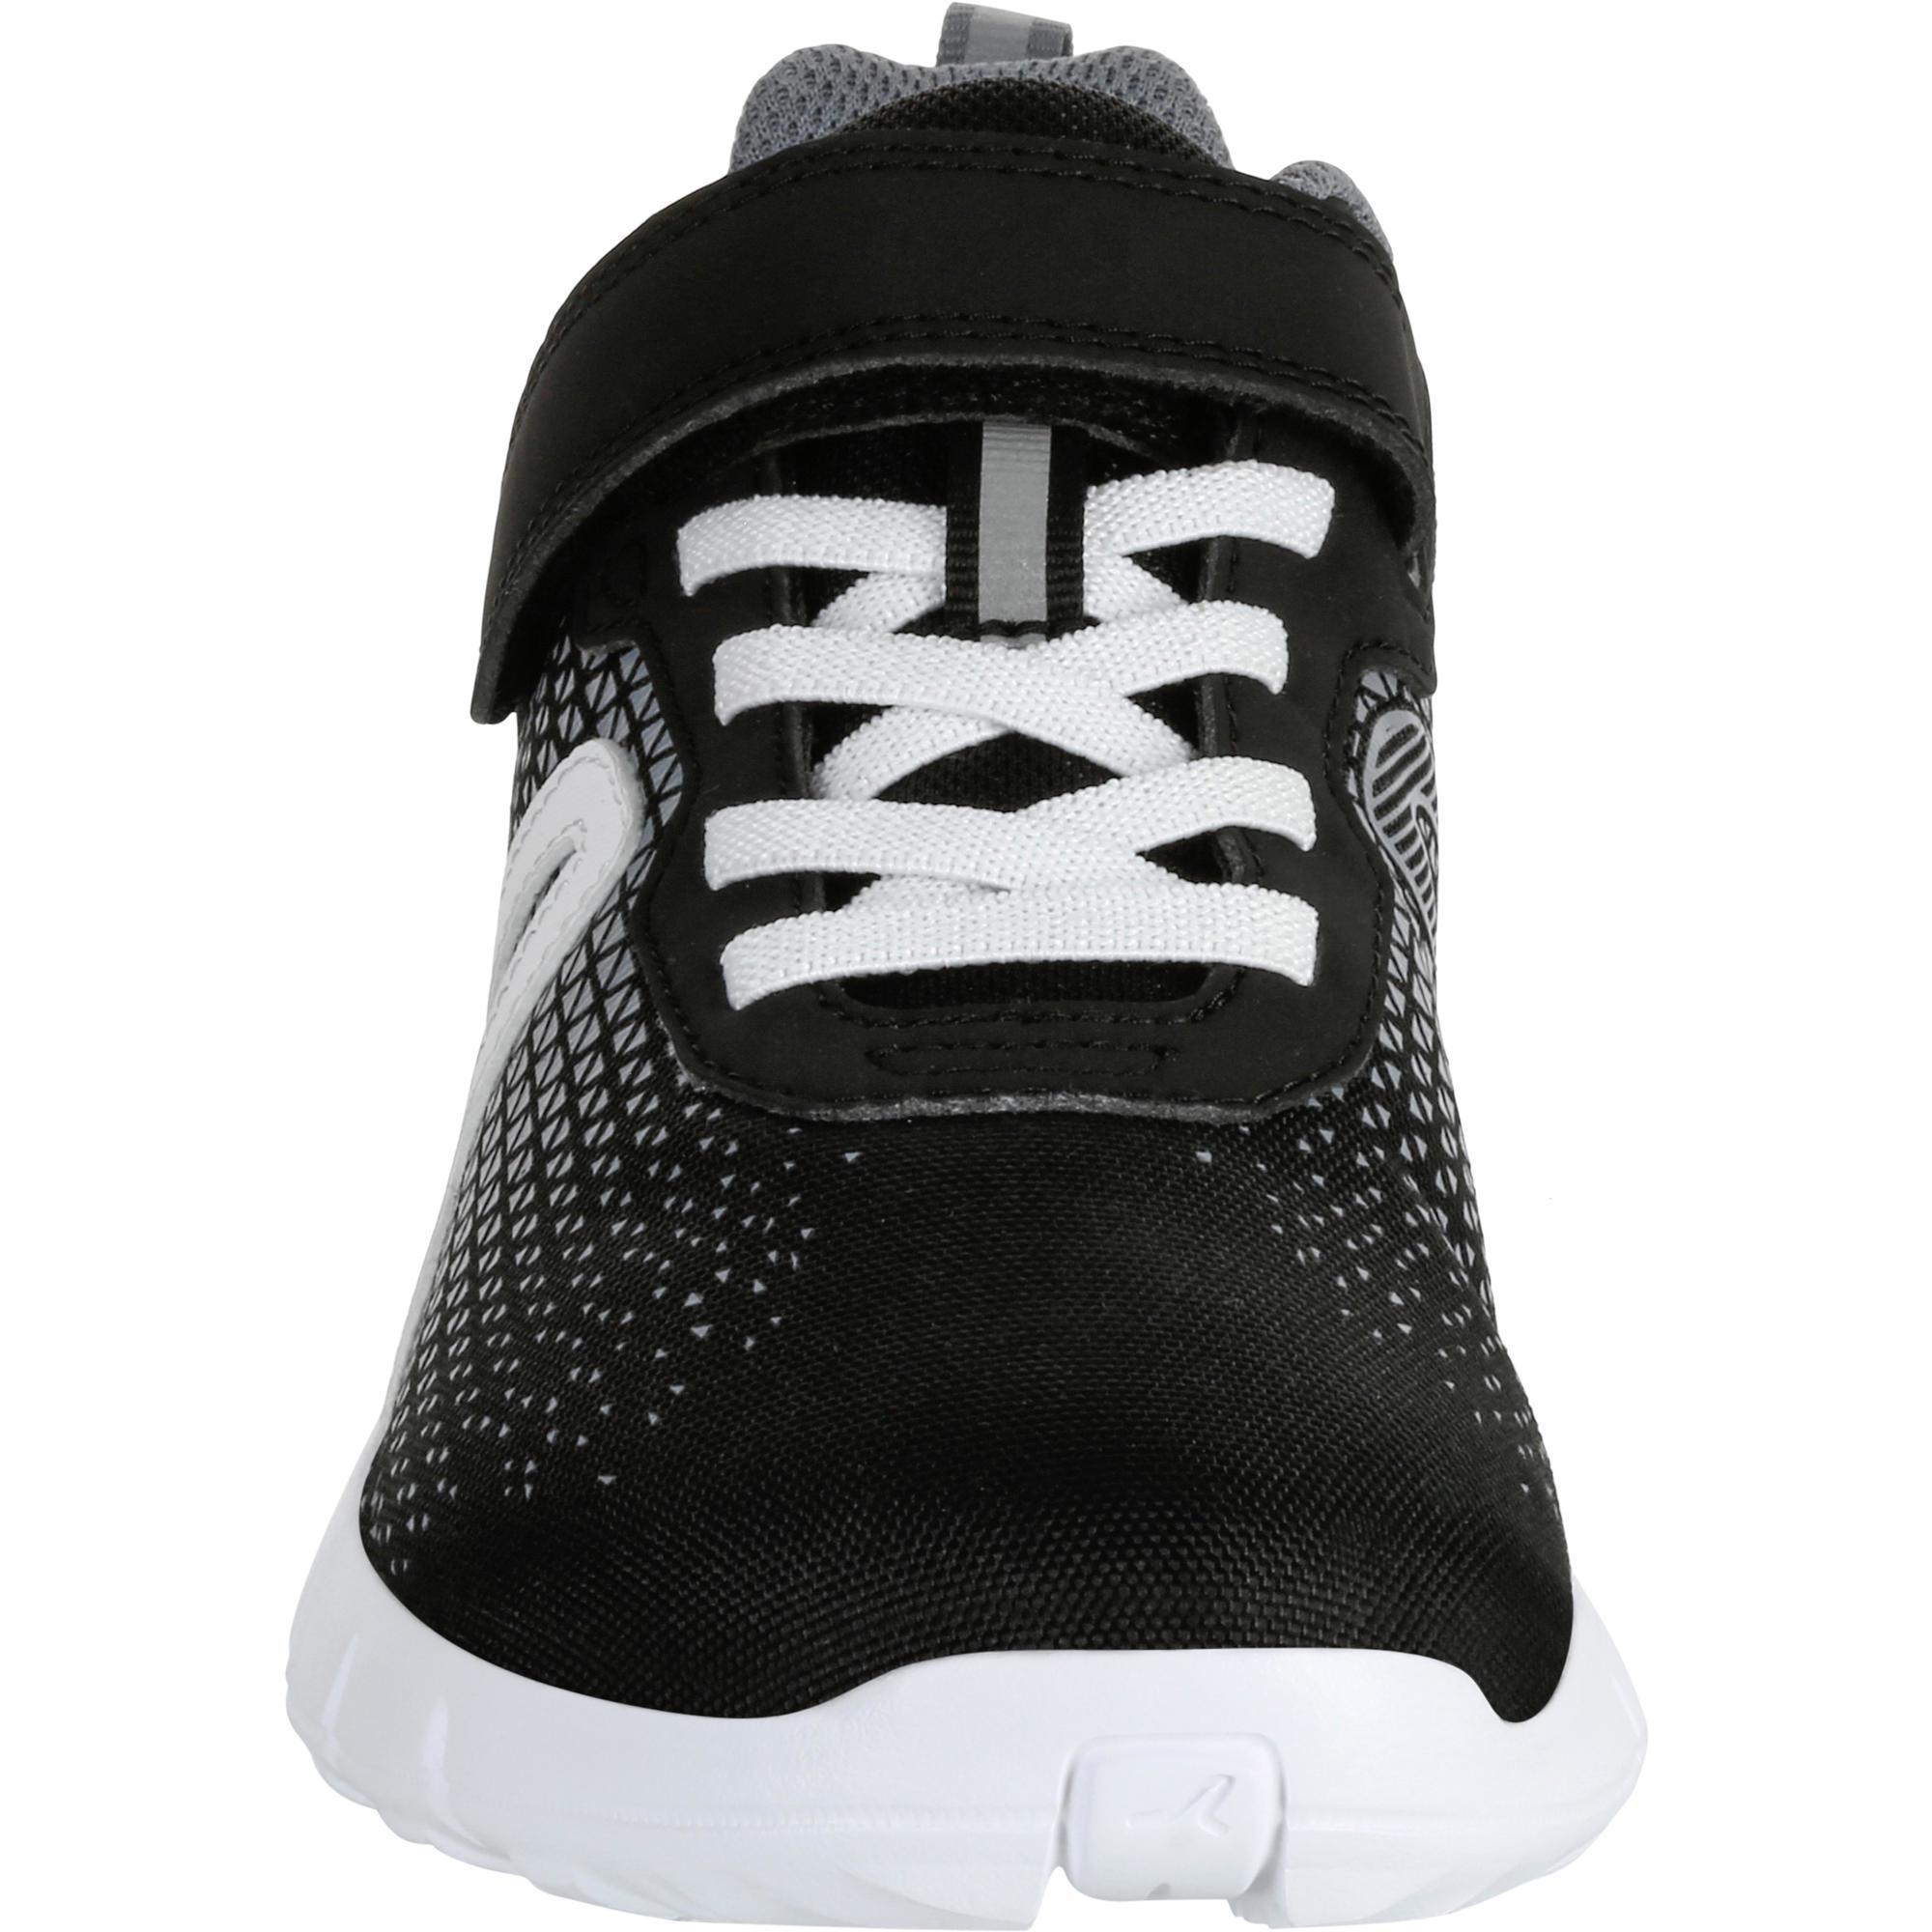 a919c82d64 enfant Newfeel marche 140 Decathlon Chaussures Soft sportive wF6cqx1pwH